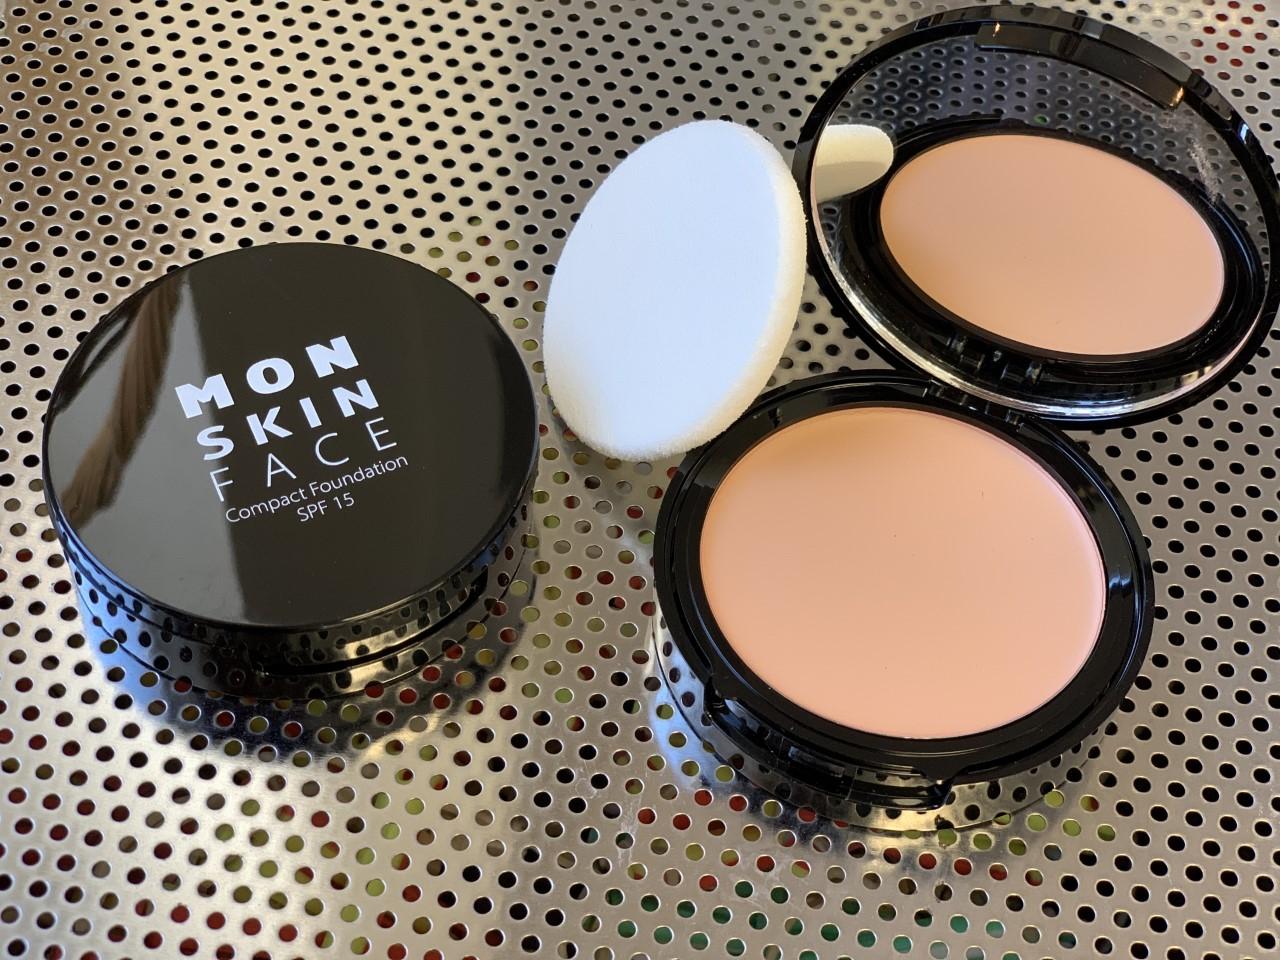 Mon-Skin-Face-Foundation